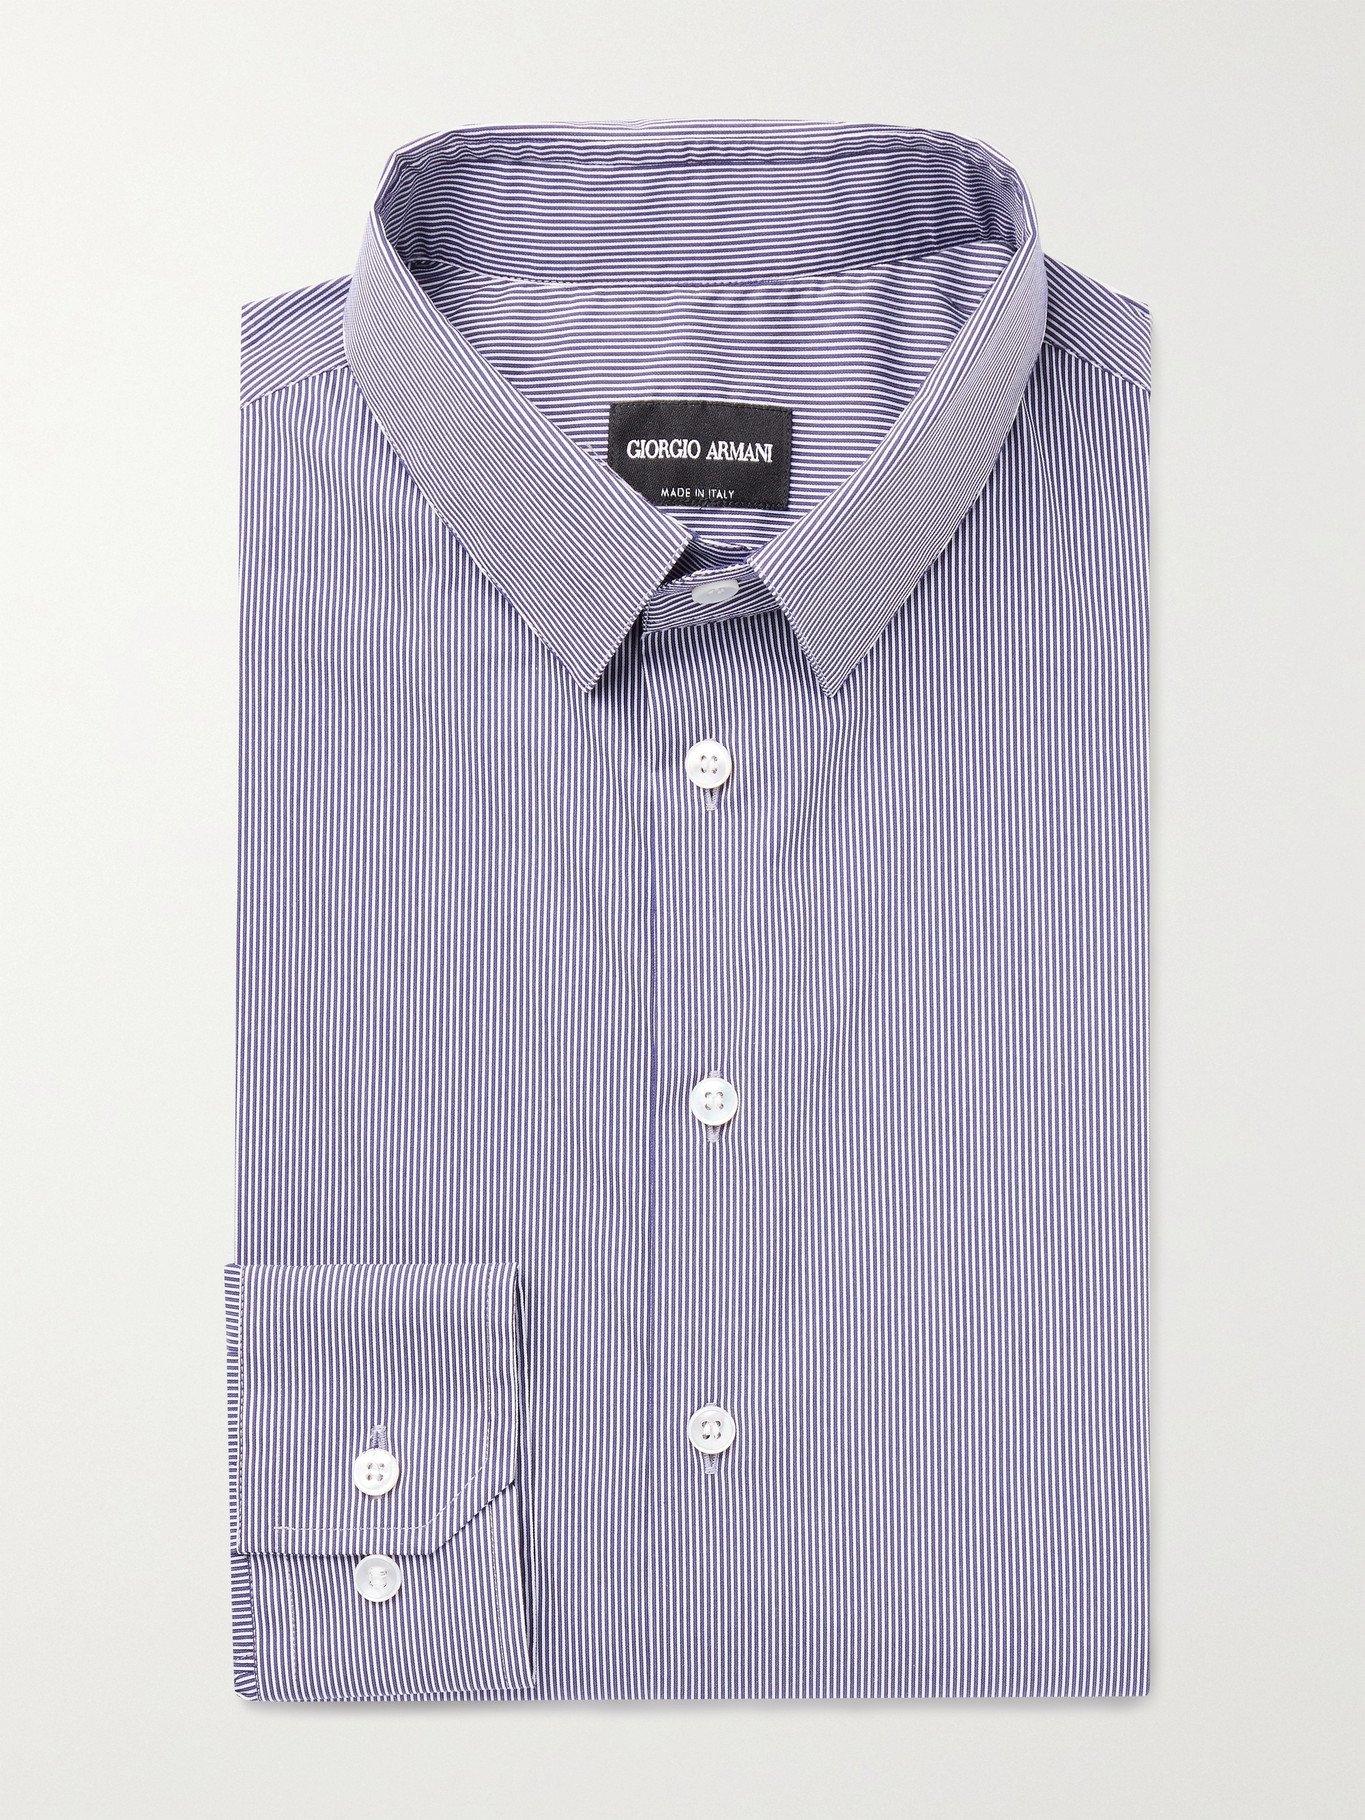 GIORGIO ARMANI - Slim-Fit Pinstriped Cotton-Blend Shirt - Blue